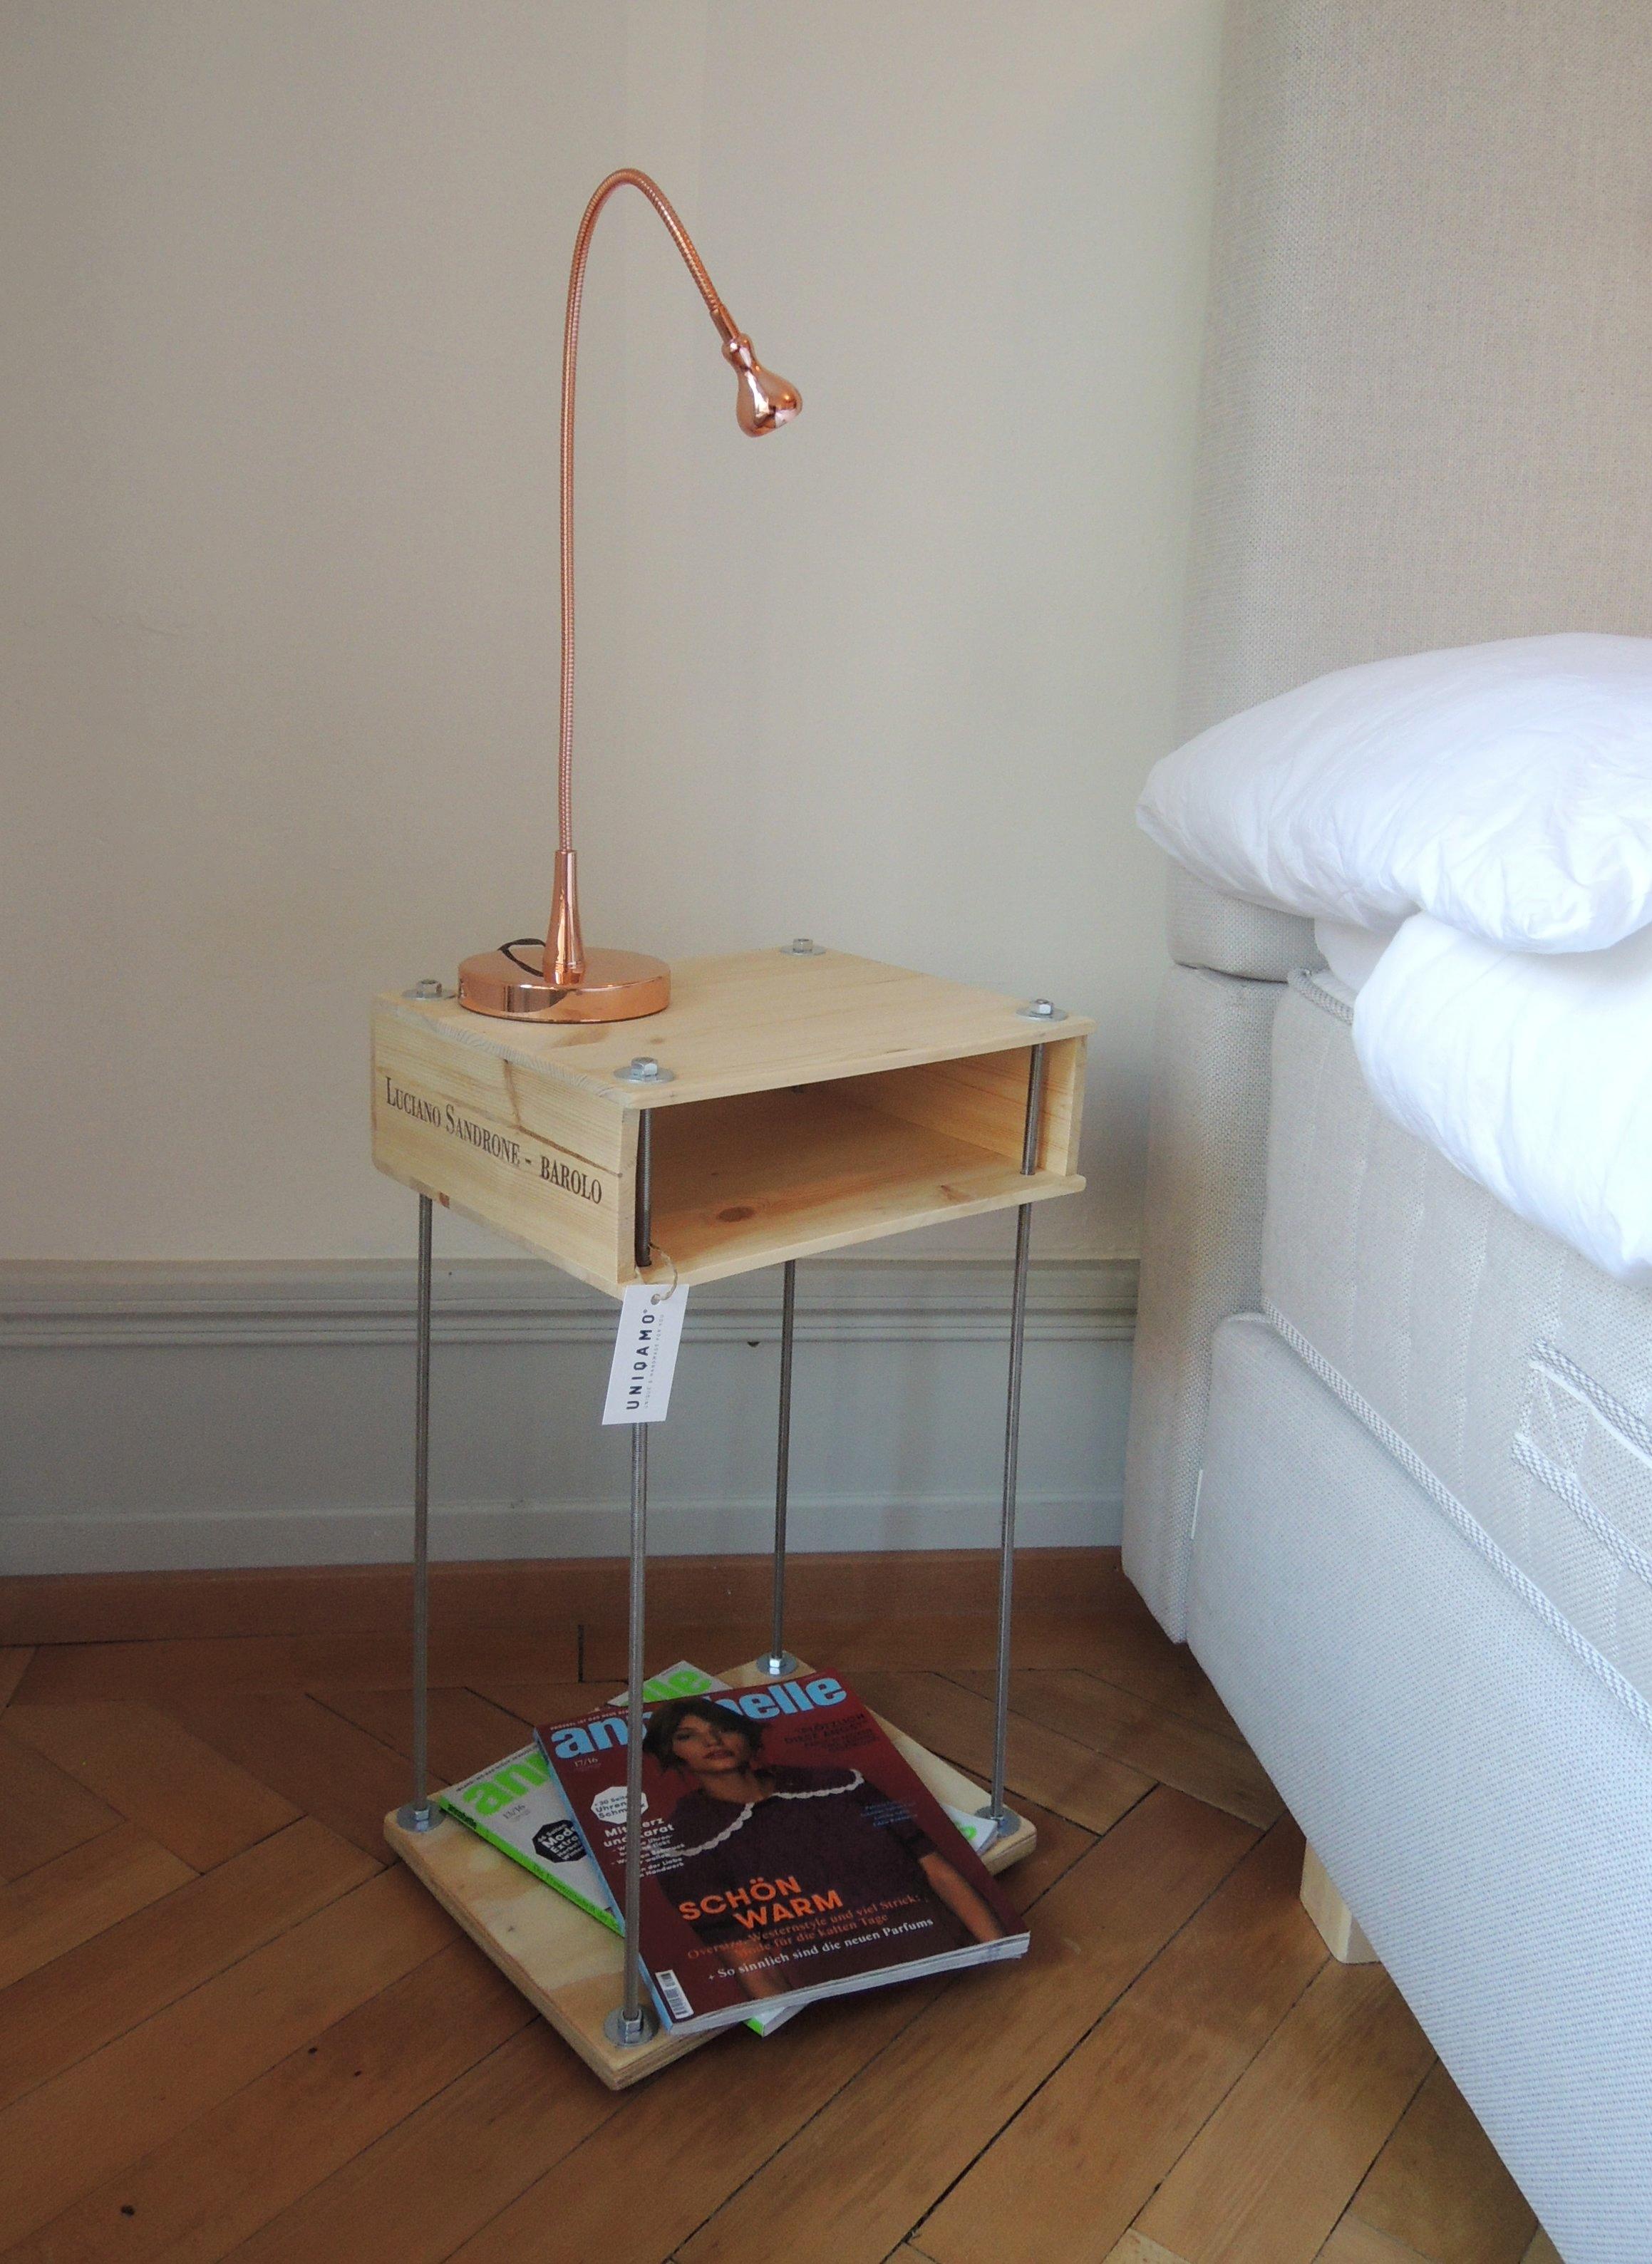 uniqamo_table_design_upcycled_furniture.JPG